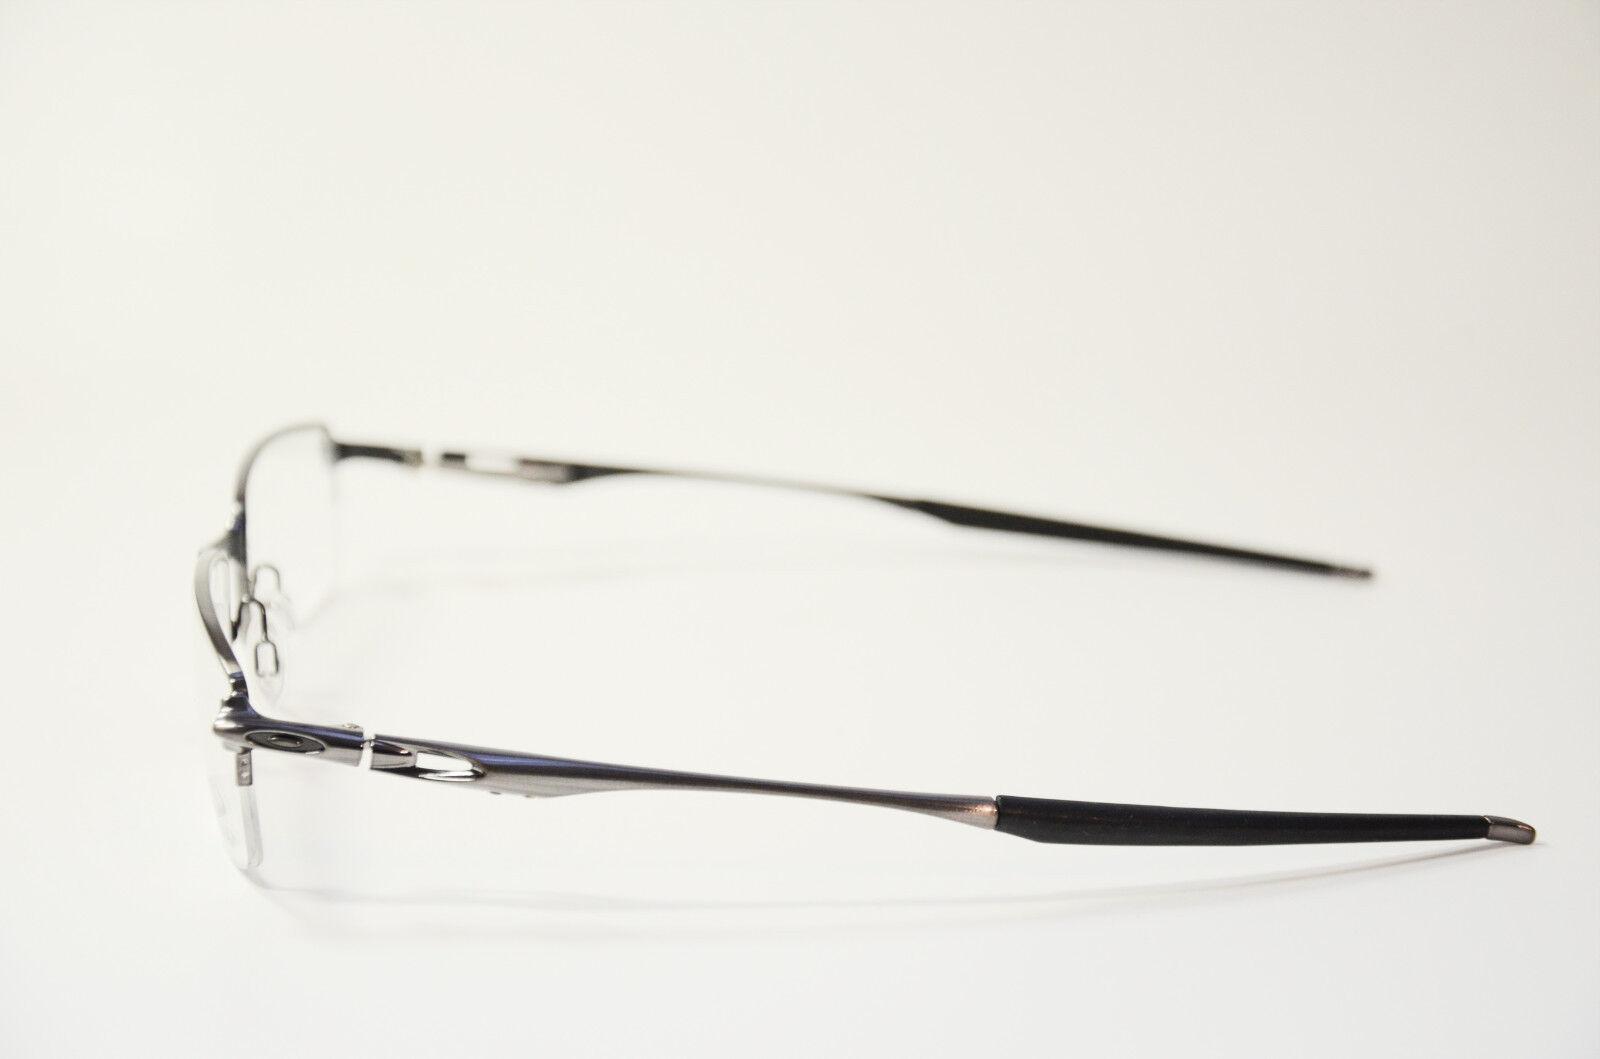 Oakley Lesebrille OX 3119 04 Brille Herren Metall 1,0 1,5 2,0 2,5 3,0 3,5 4,0